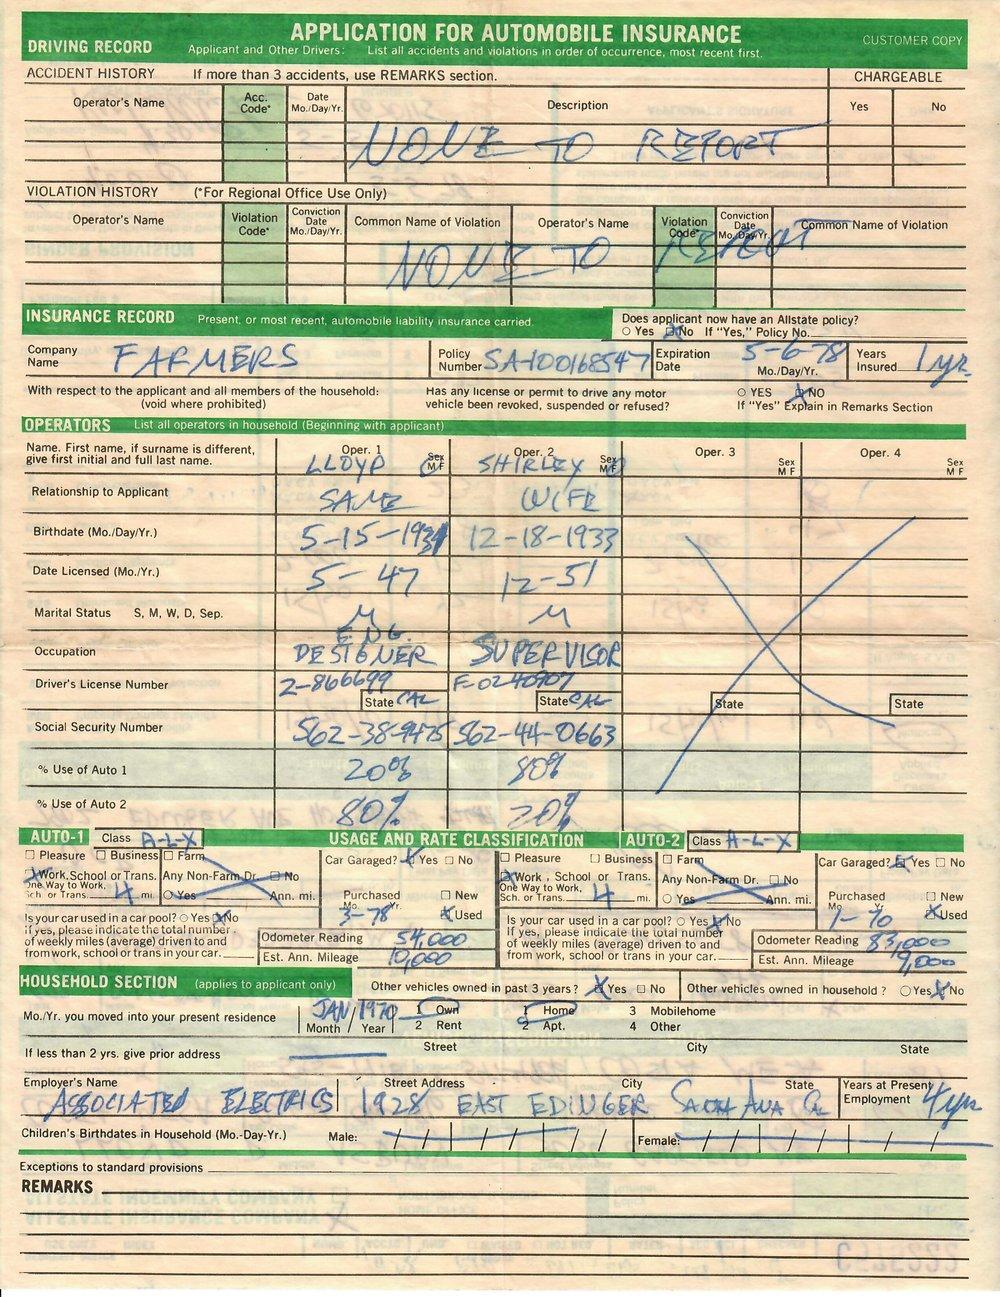 1973 Insurance pg2.jpeg